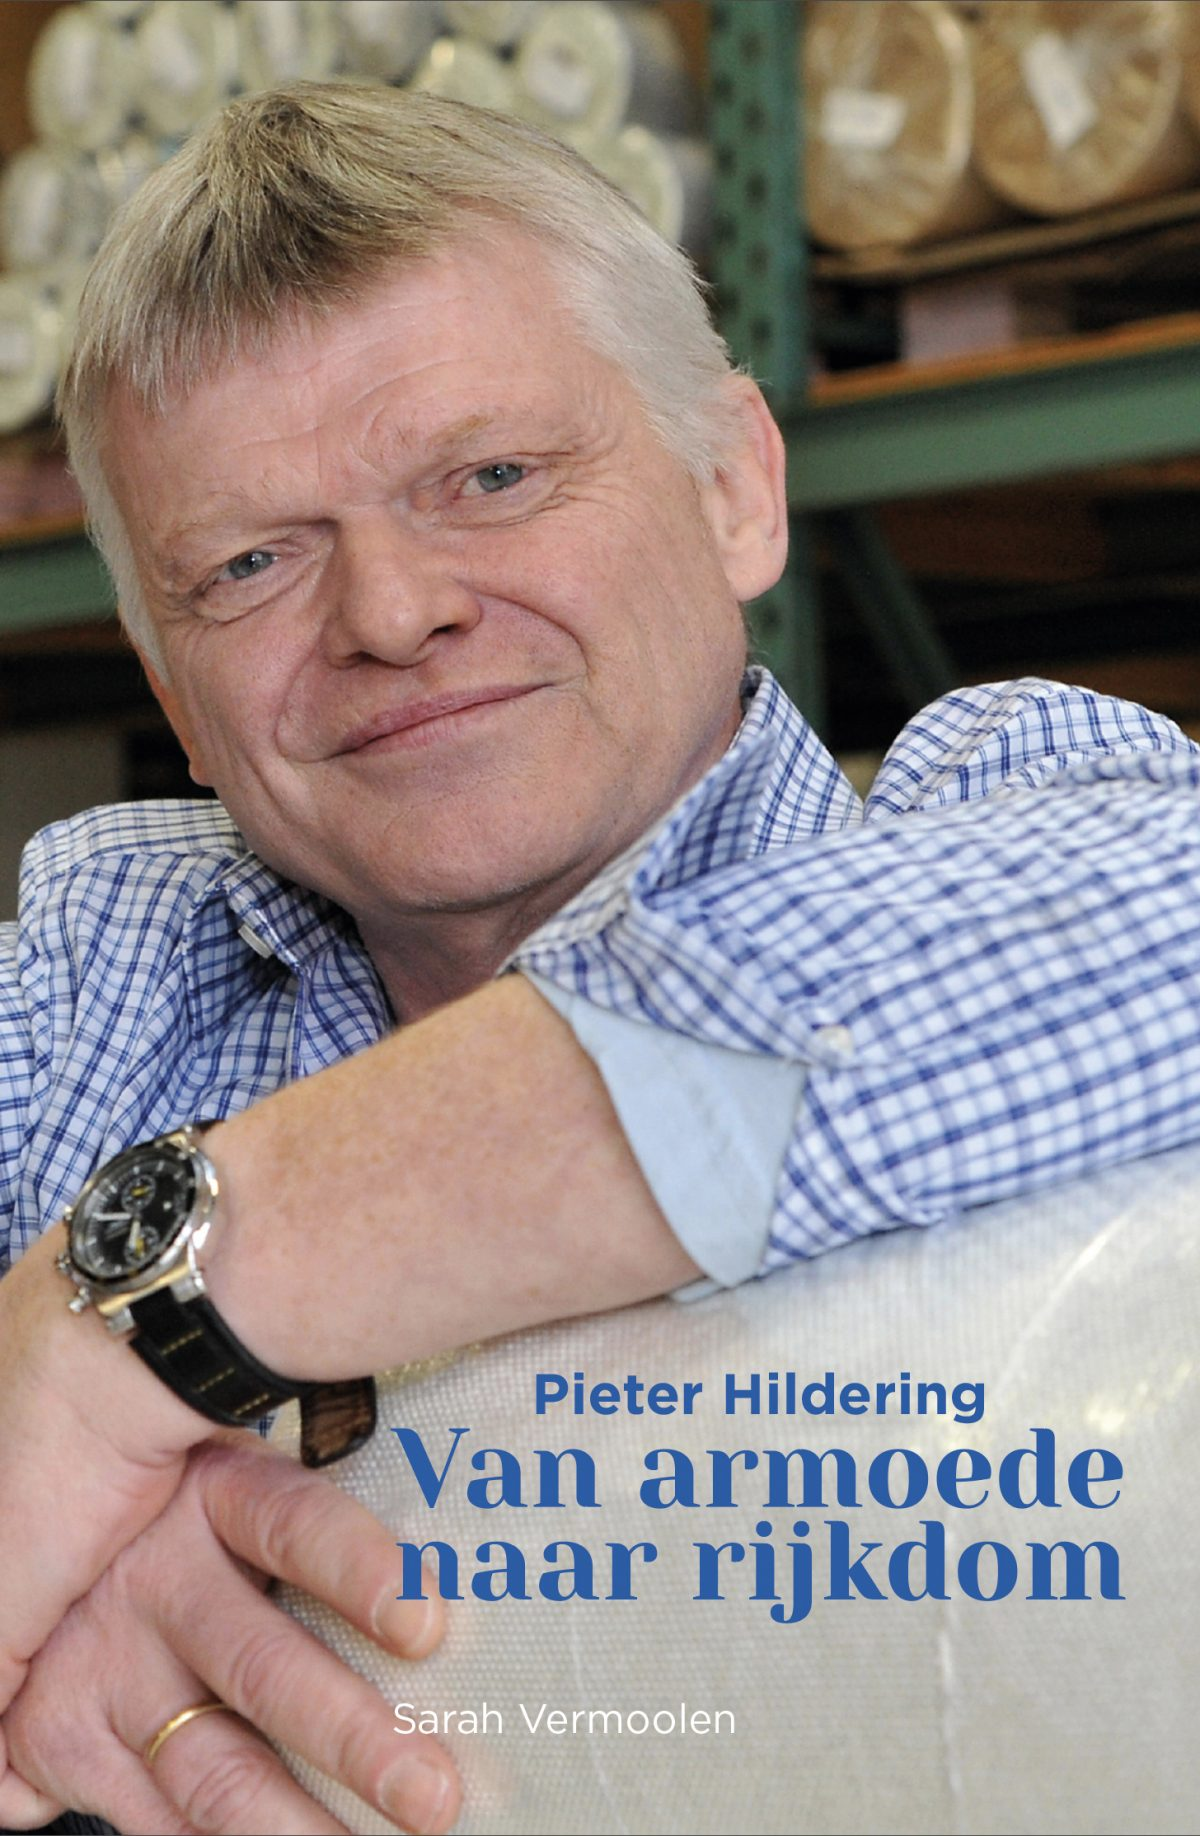 Pieter Hildering.